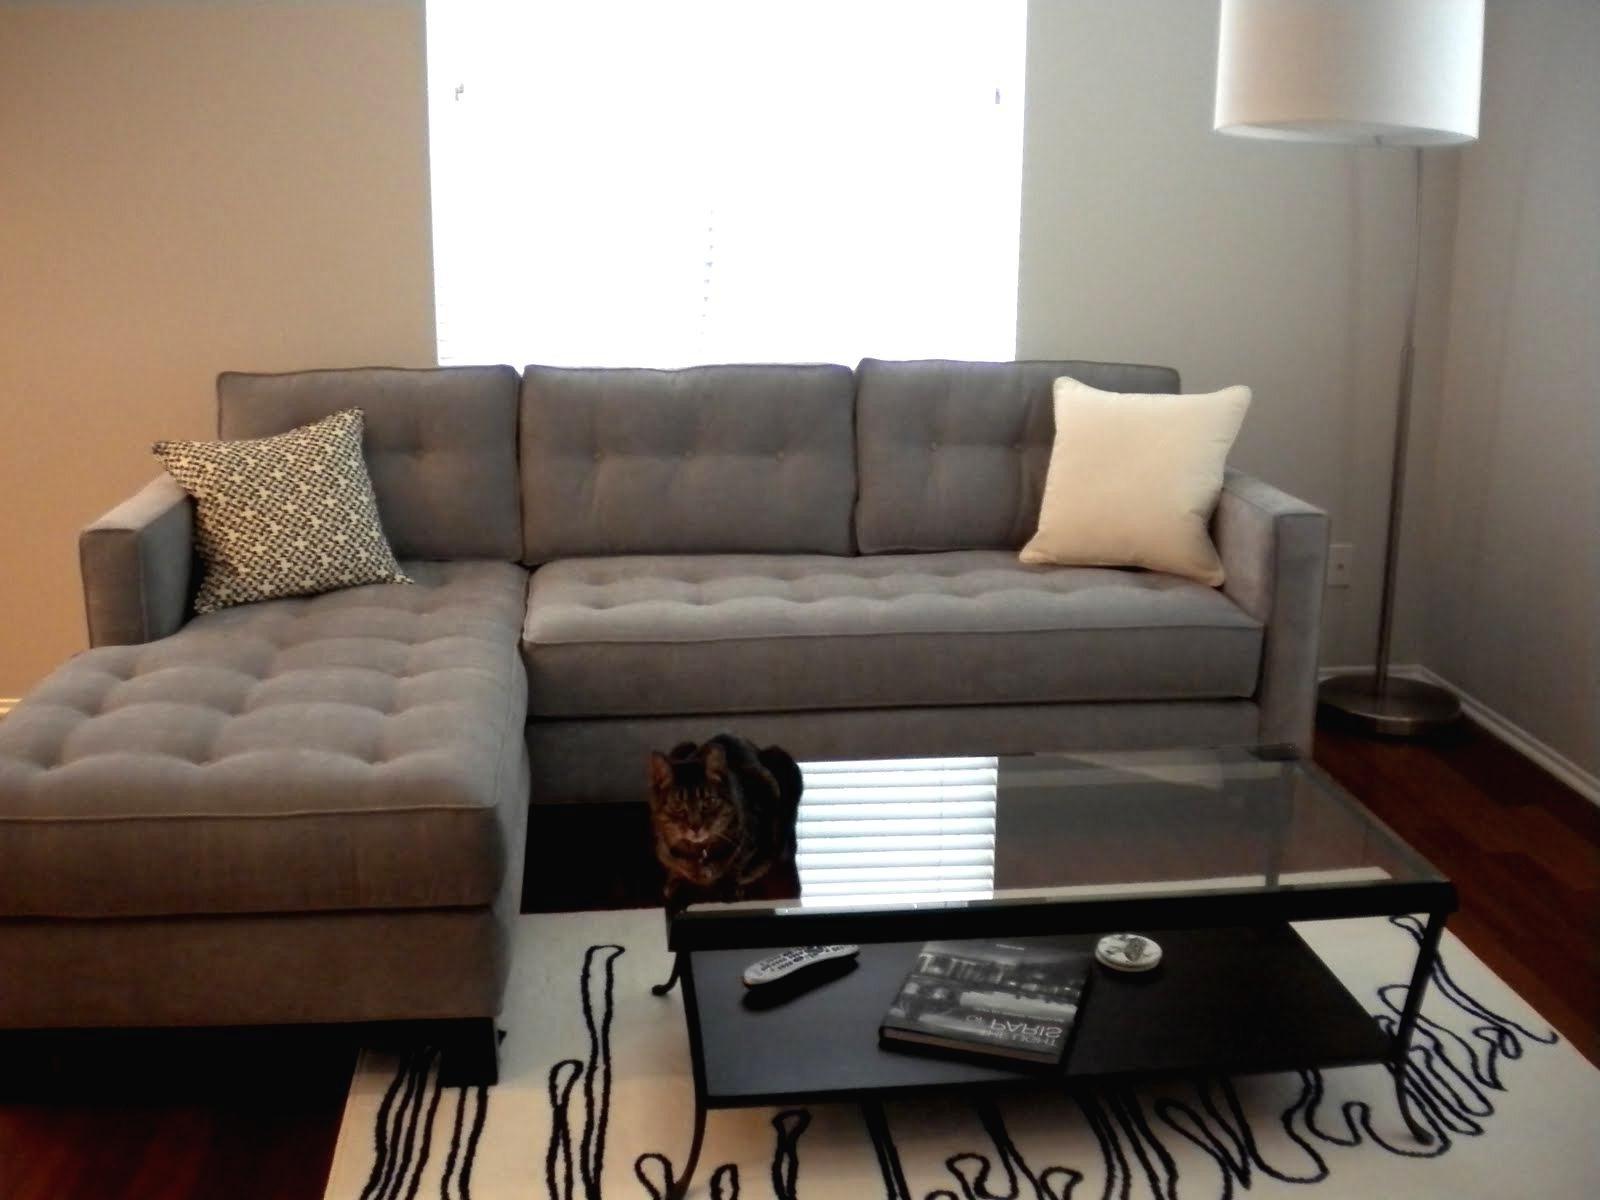 Kmart Furniture Sale (Gallery 2 of 20)